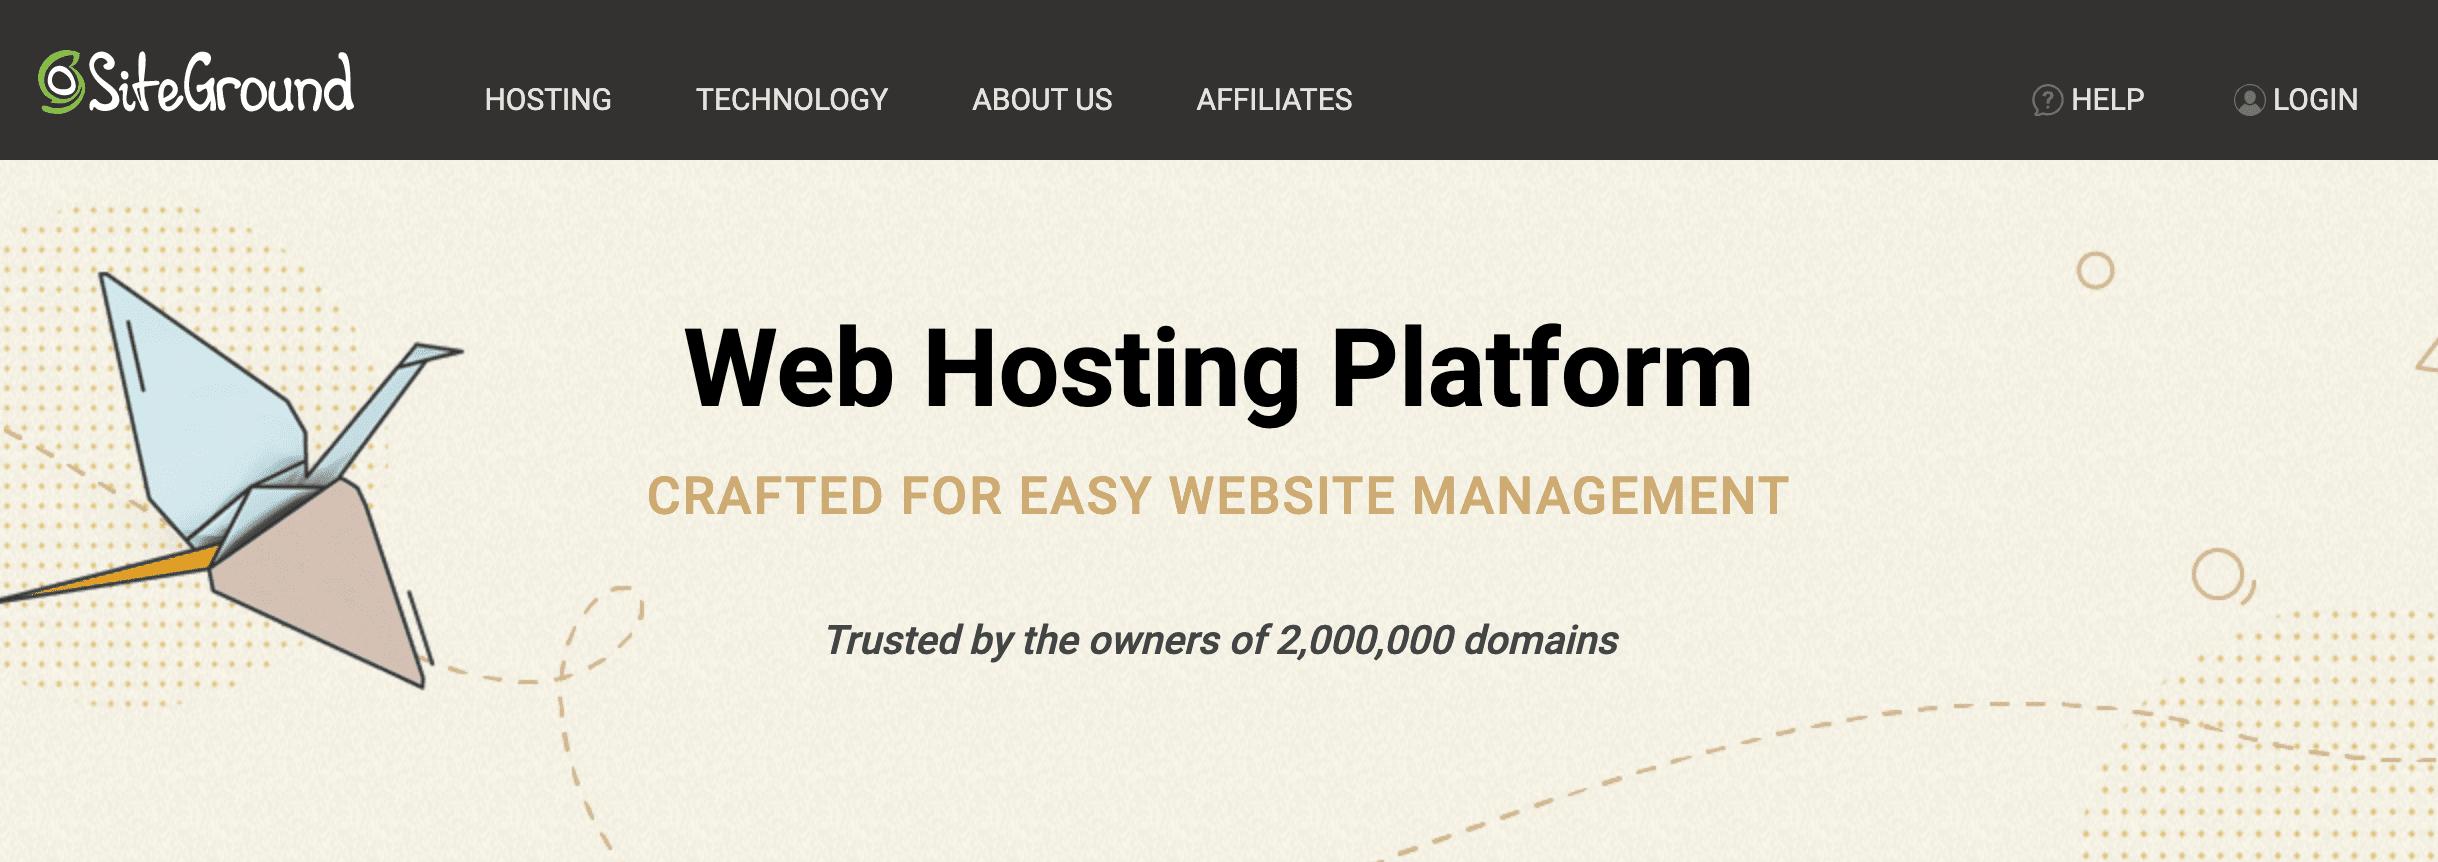 WordPress staging site.